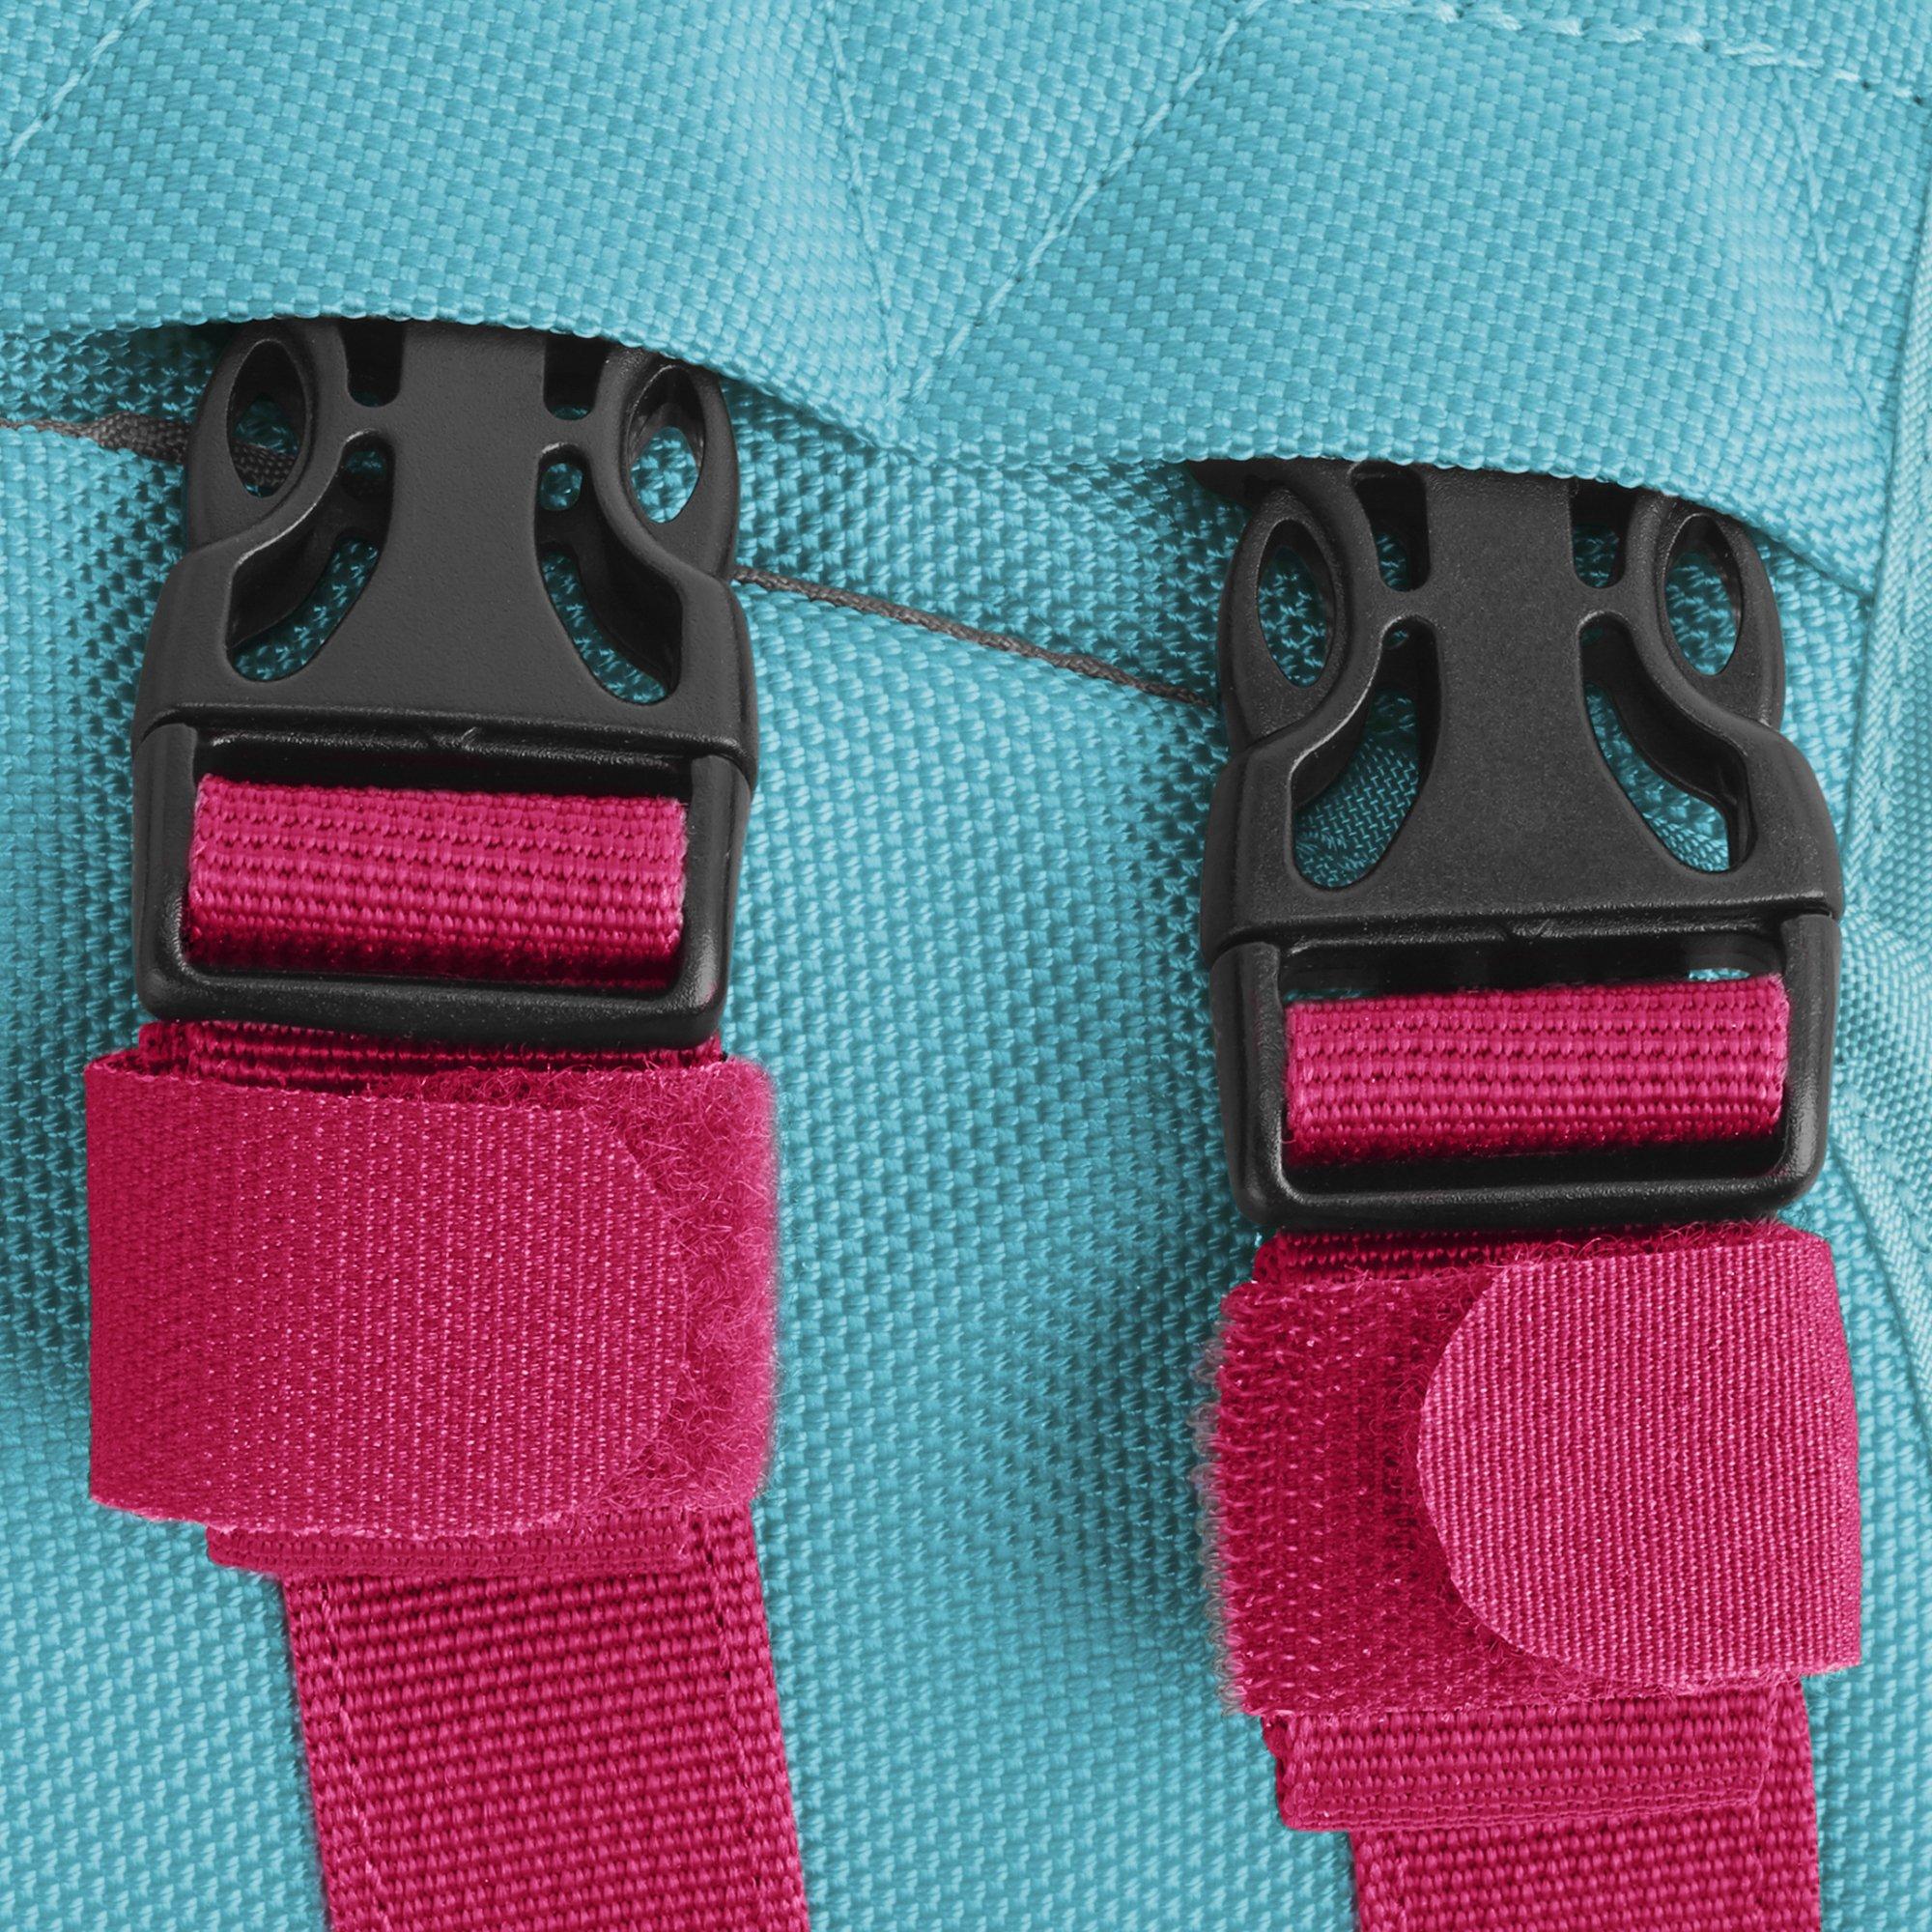 RUFFWEAR - Float Coat Reflective Life Jacket for Dogs, Blue Atoll, Large by RUFFWEAR (Image #4)